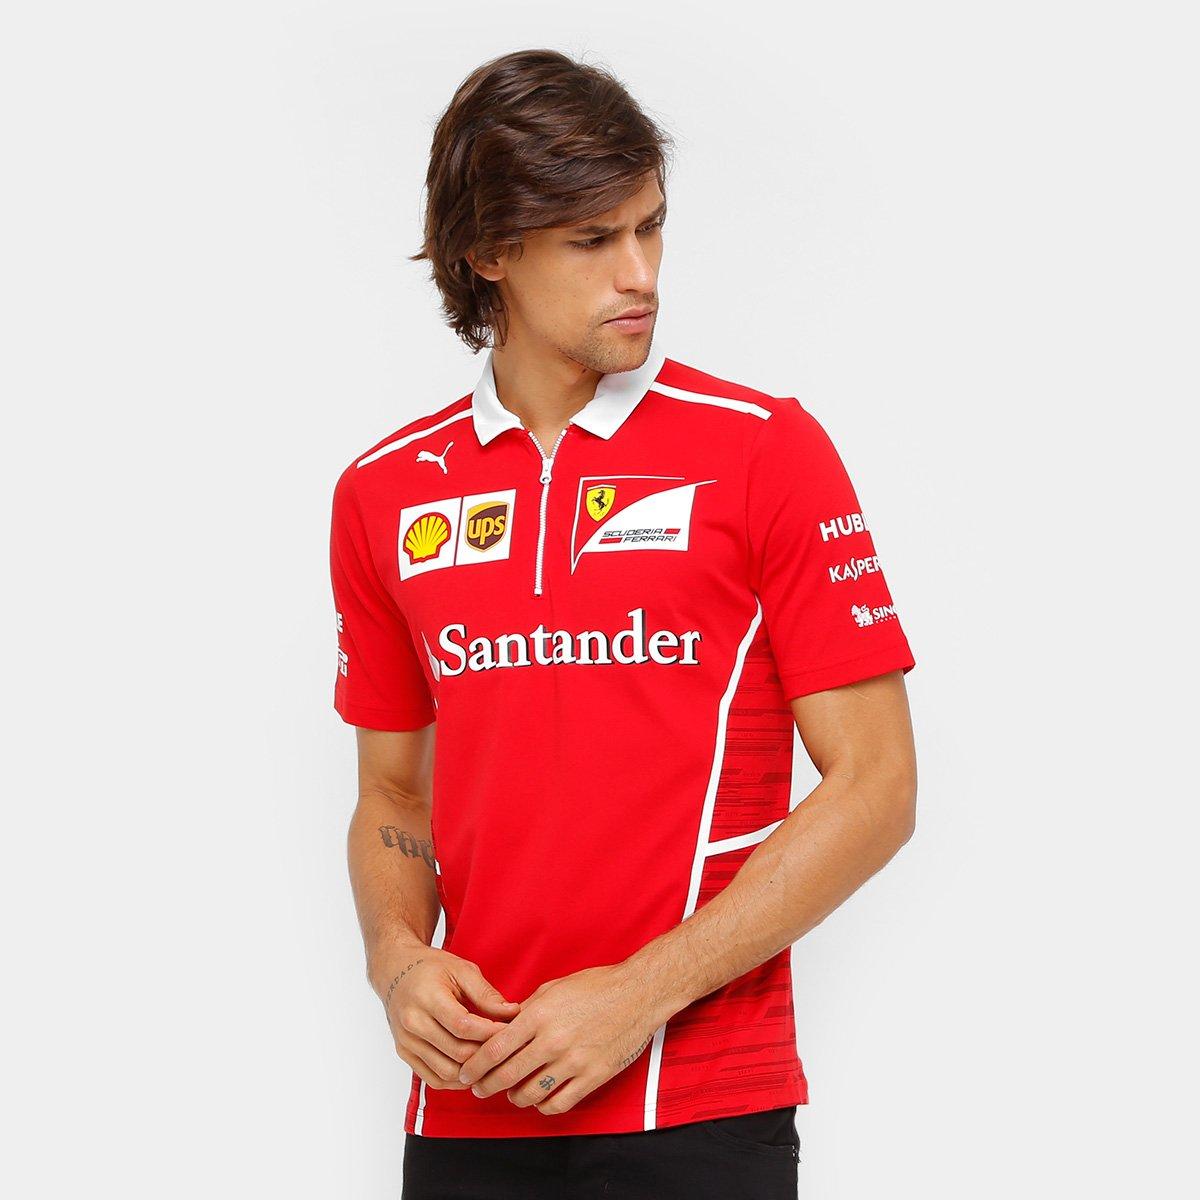 Camiseta Polo Puma Scuderia Ferrari Team Masculina - Compre Agora ... a5882852b1f